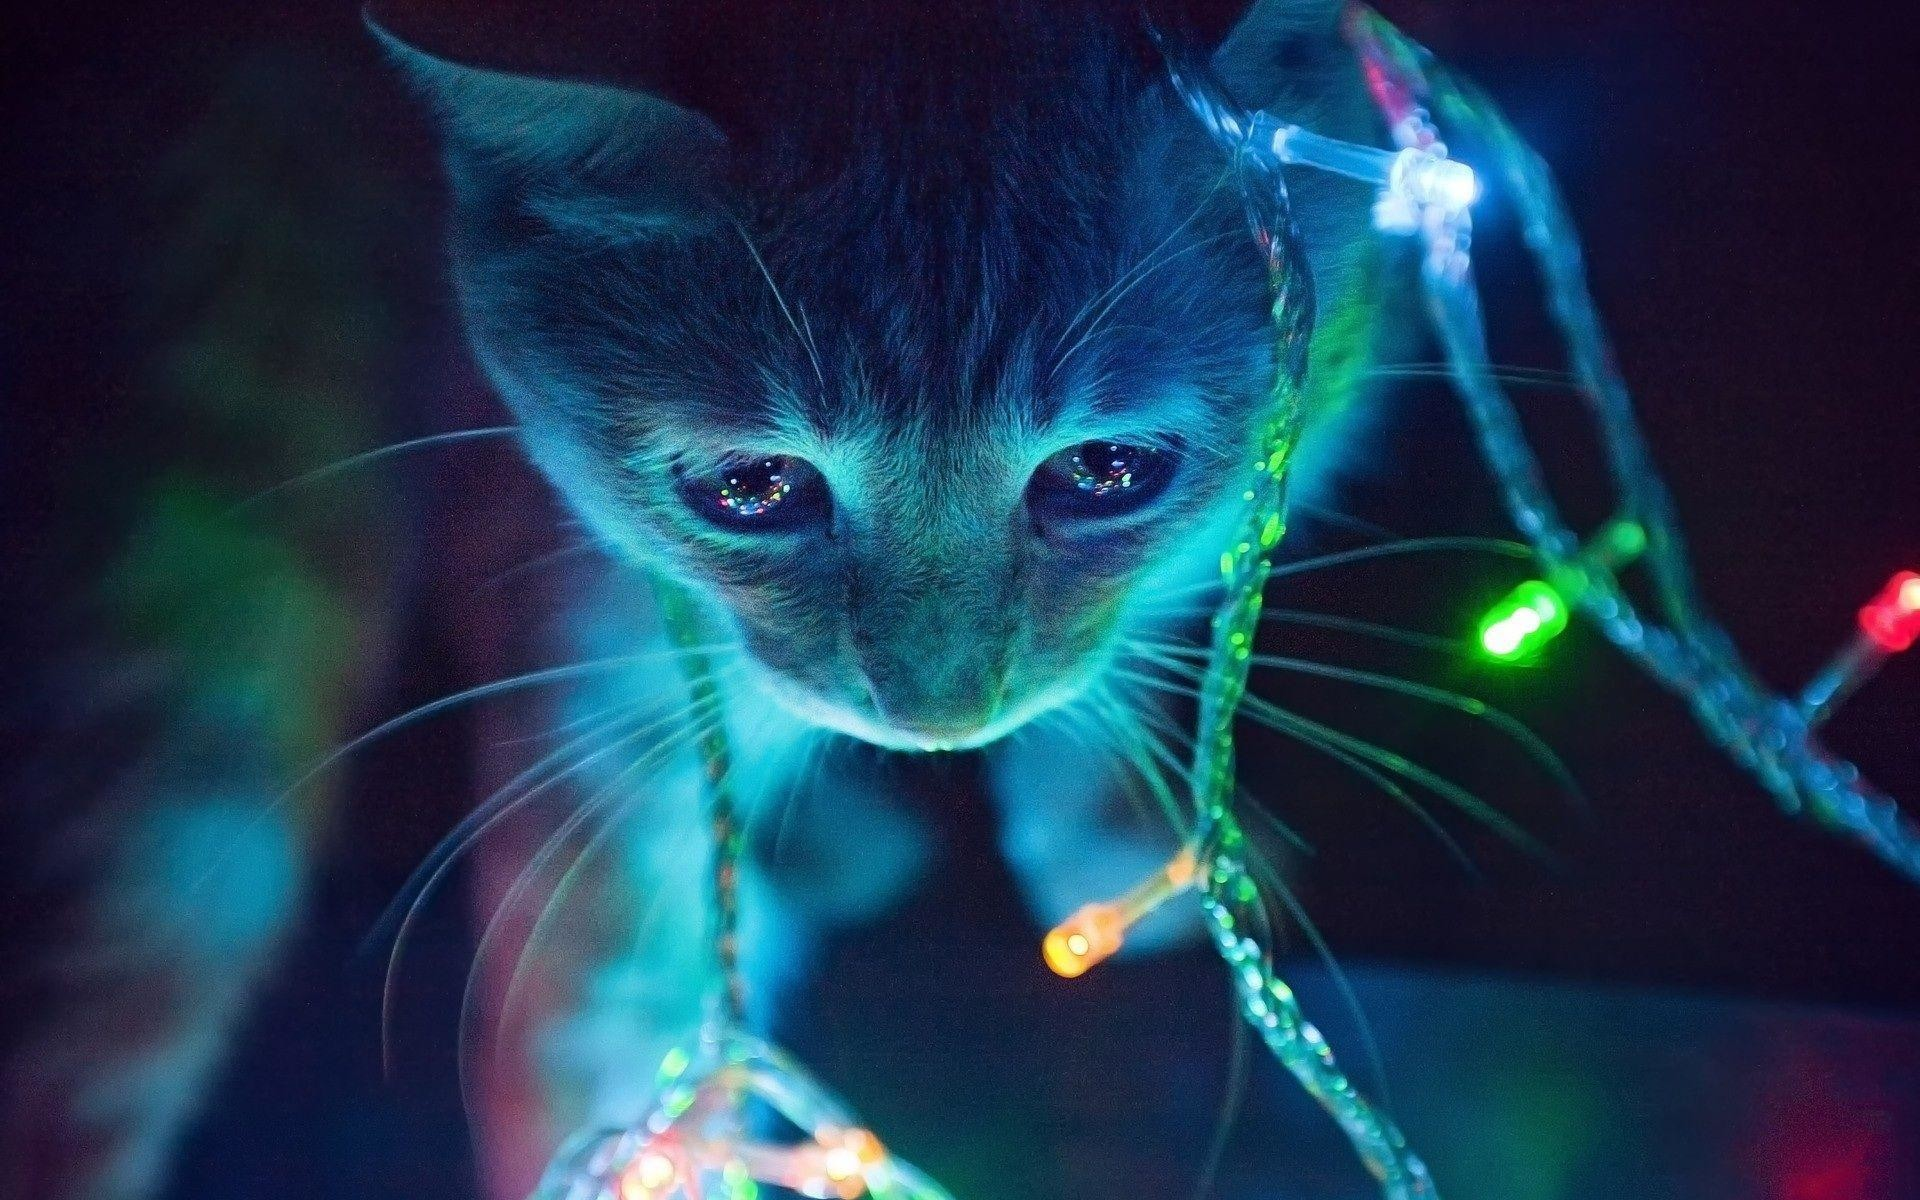 Christmas Kitten Wallpaper – WallpaperSafari